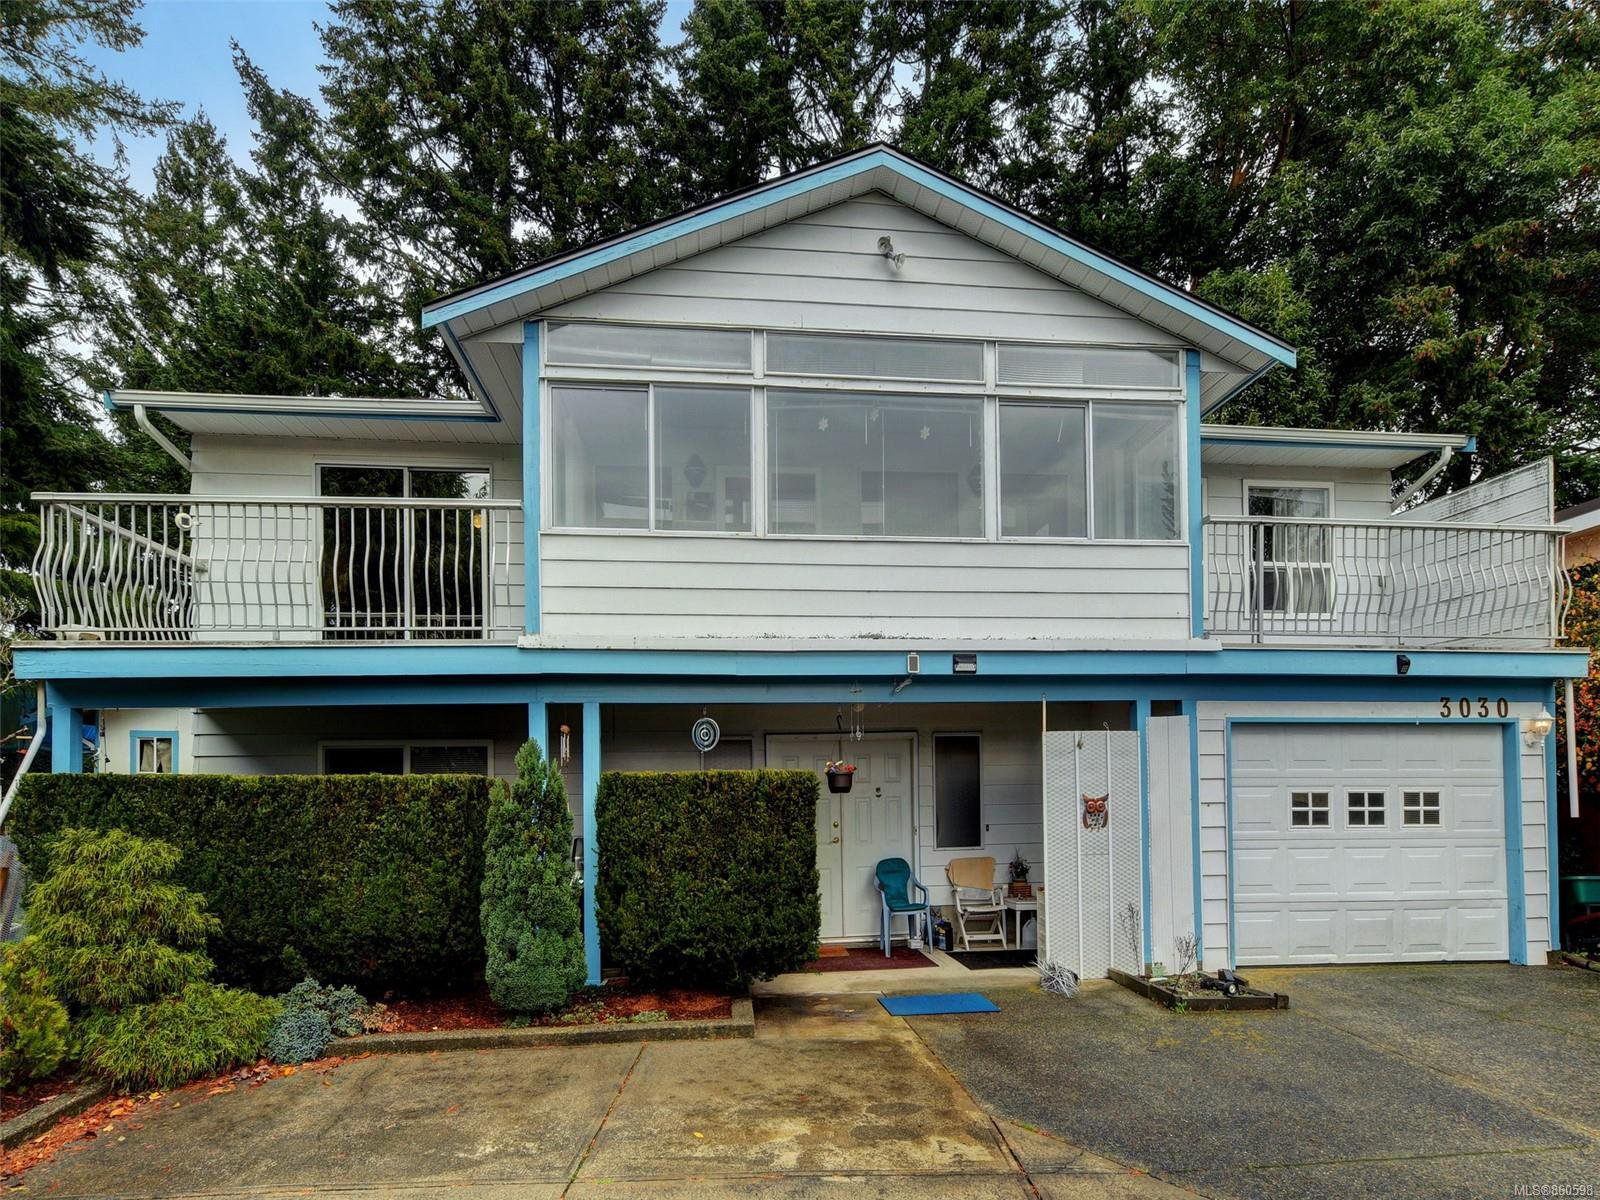 Main Photo: 3030 Shoreview Dr in : La Glen Lake House for sale (Langford)  : MLS®# 860598